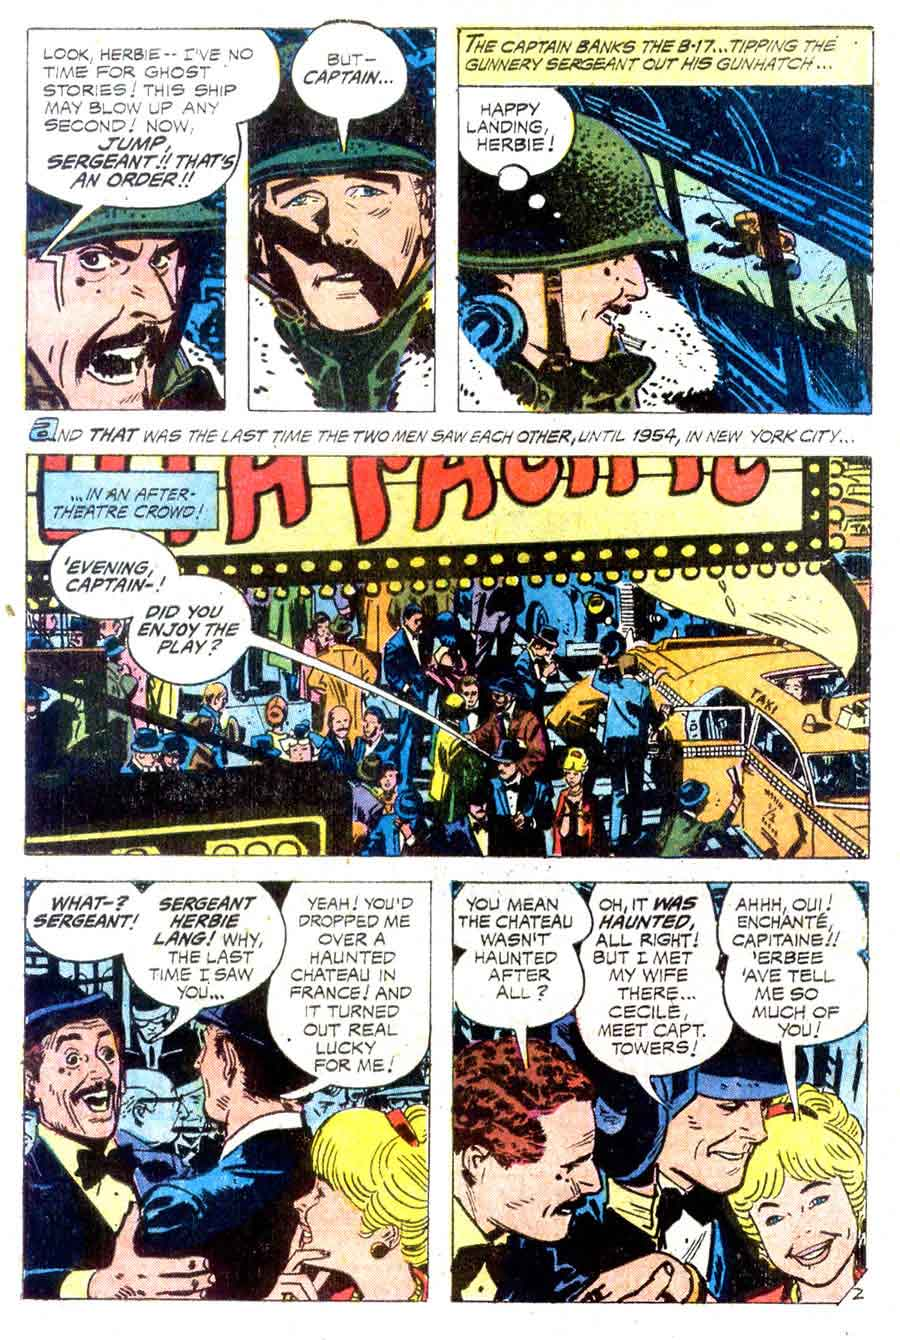 Weird War Tales v1 #10 dc bronze age comic book page art by Alex Toth